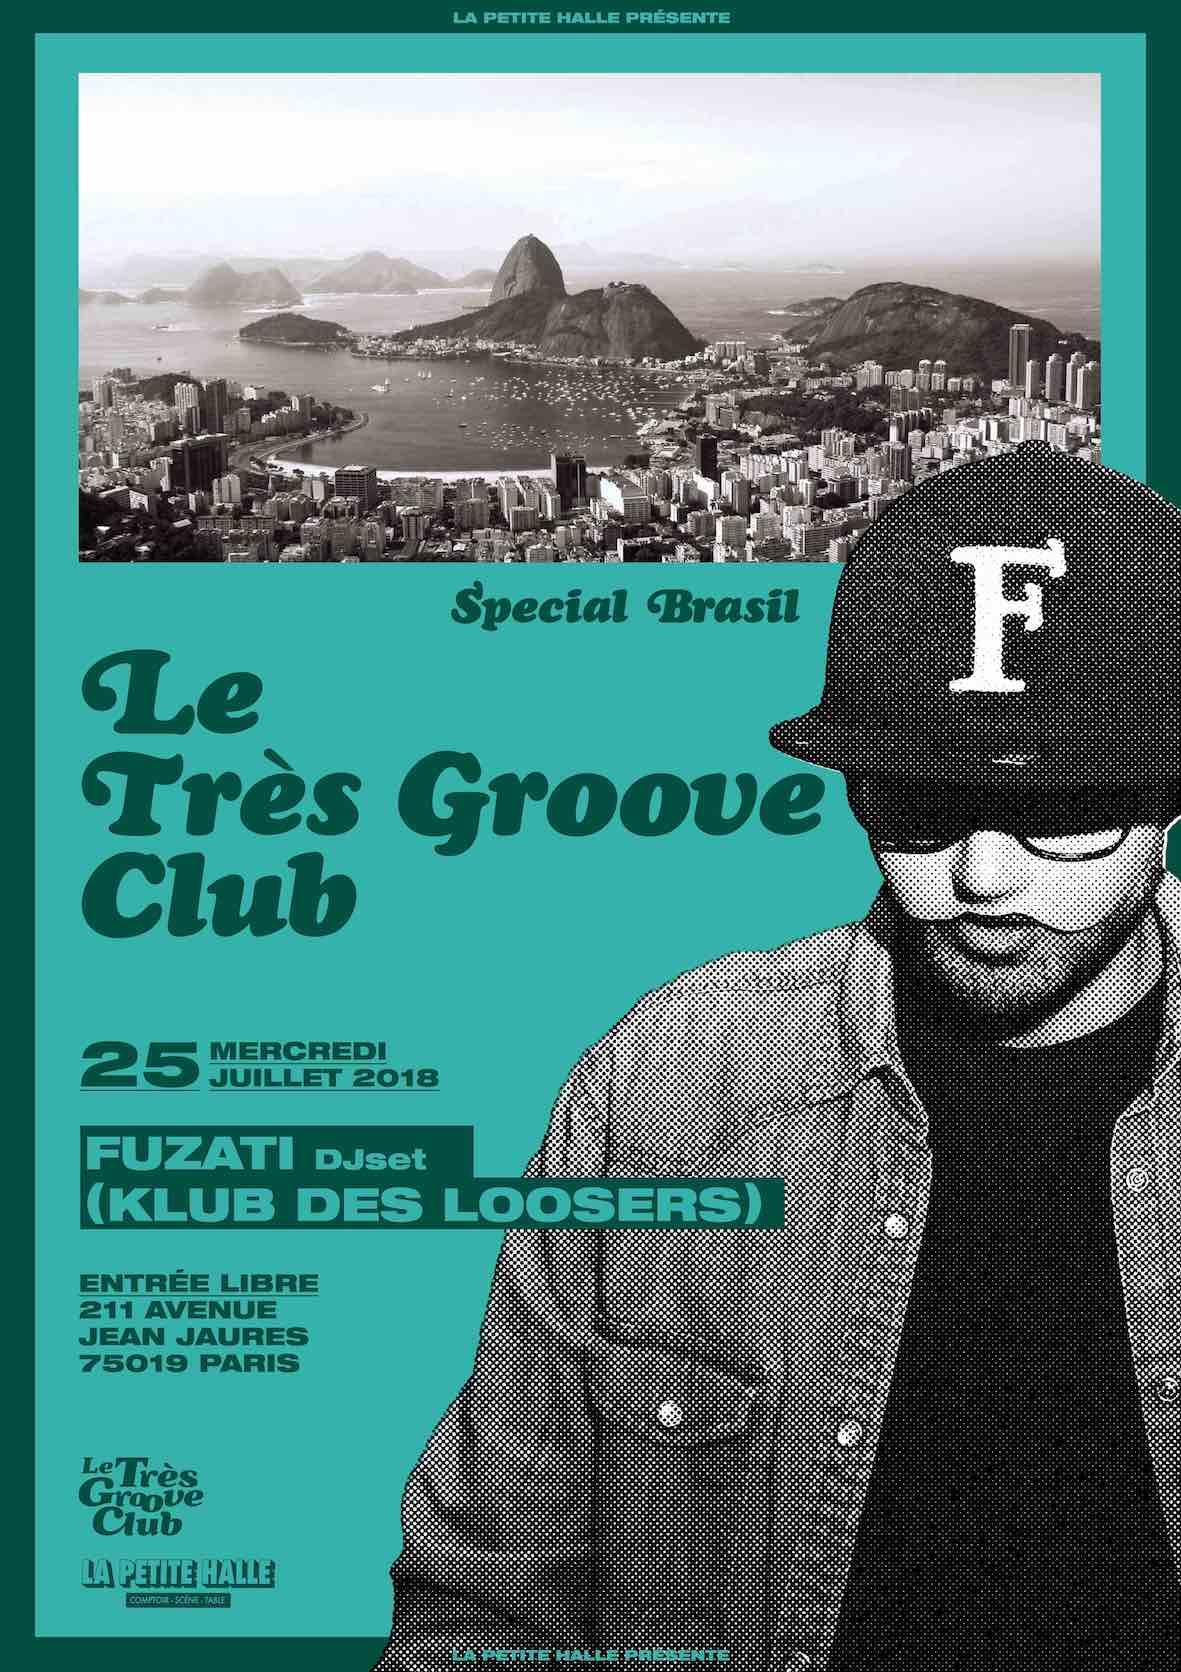 Le Très Groove Club de Fuzati (DJ SET)